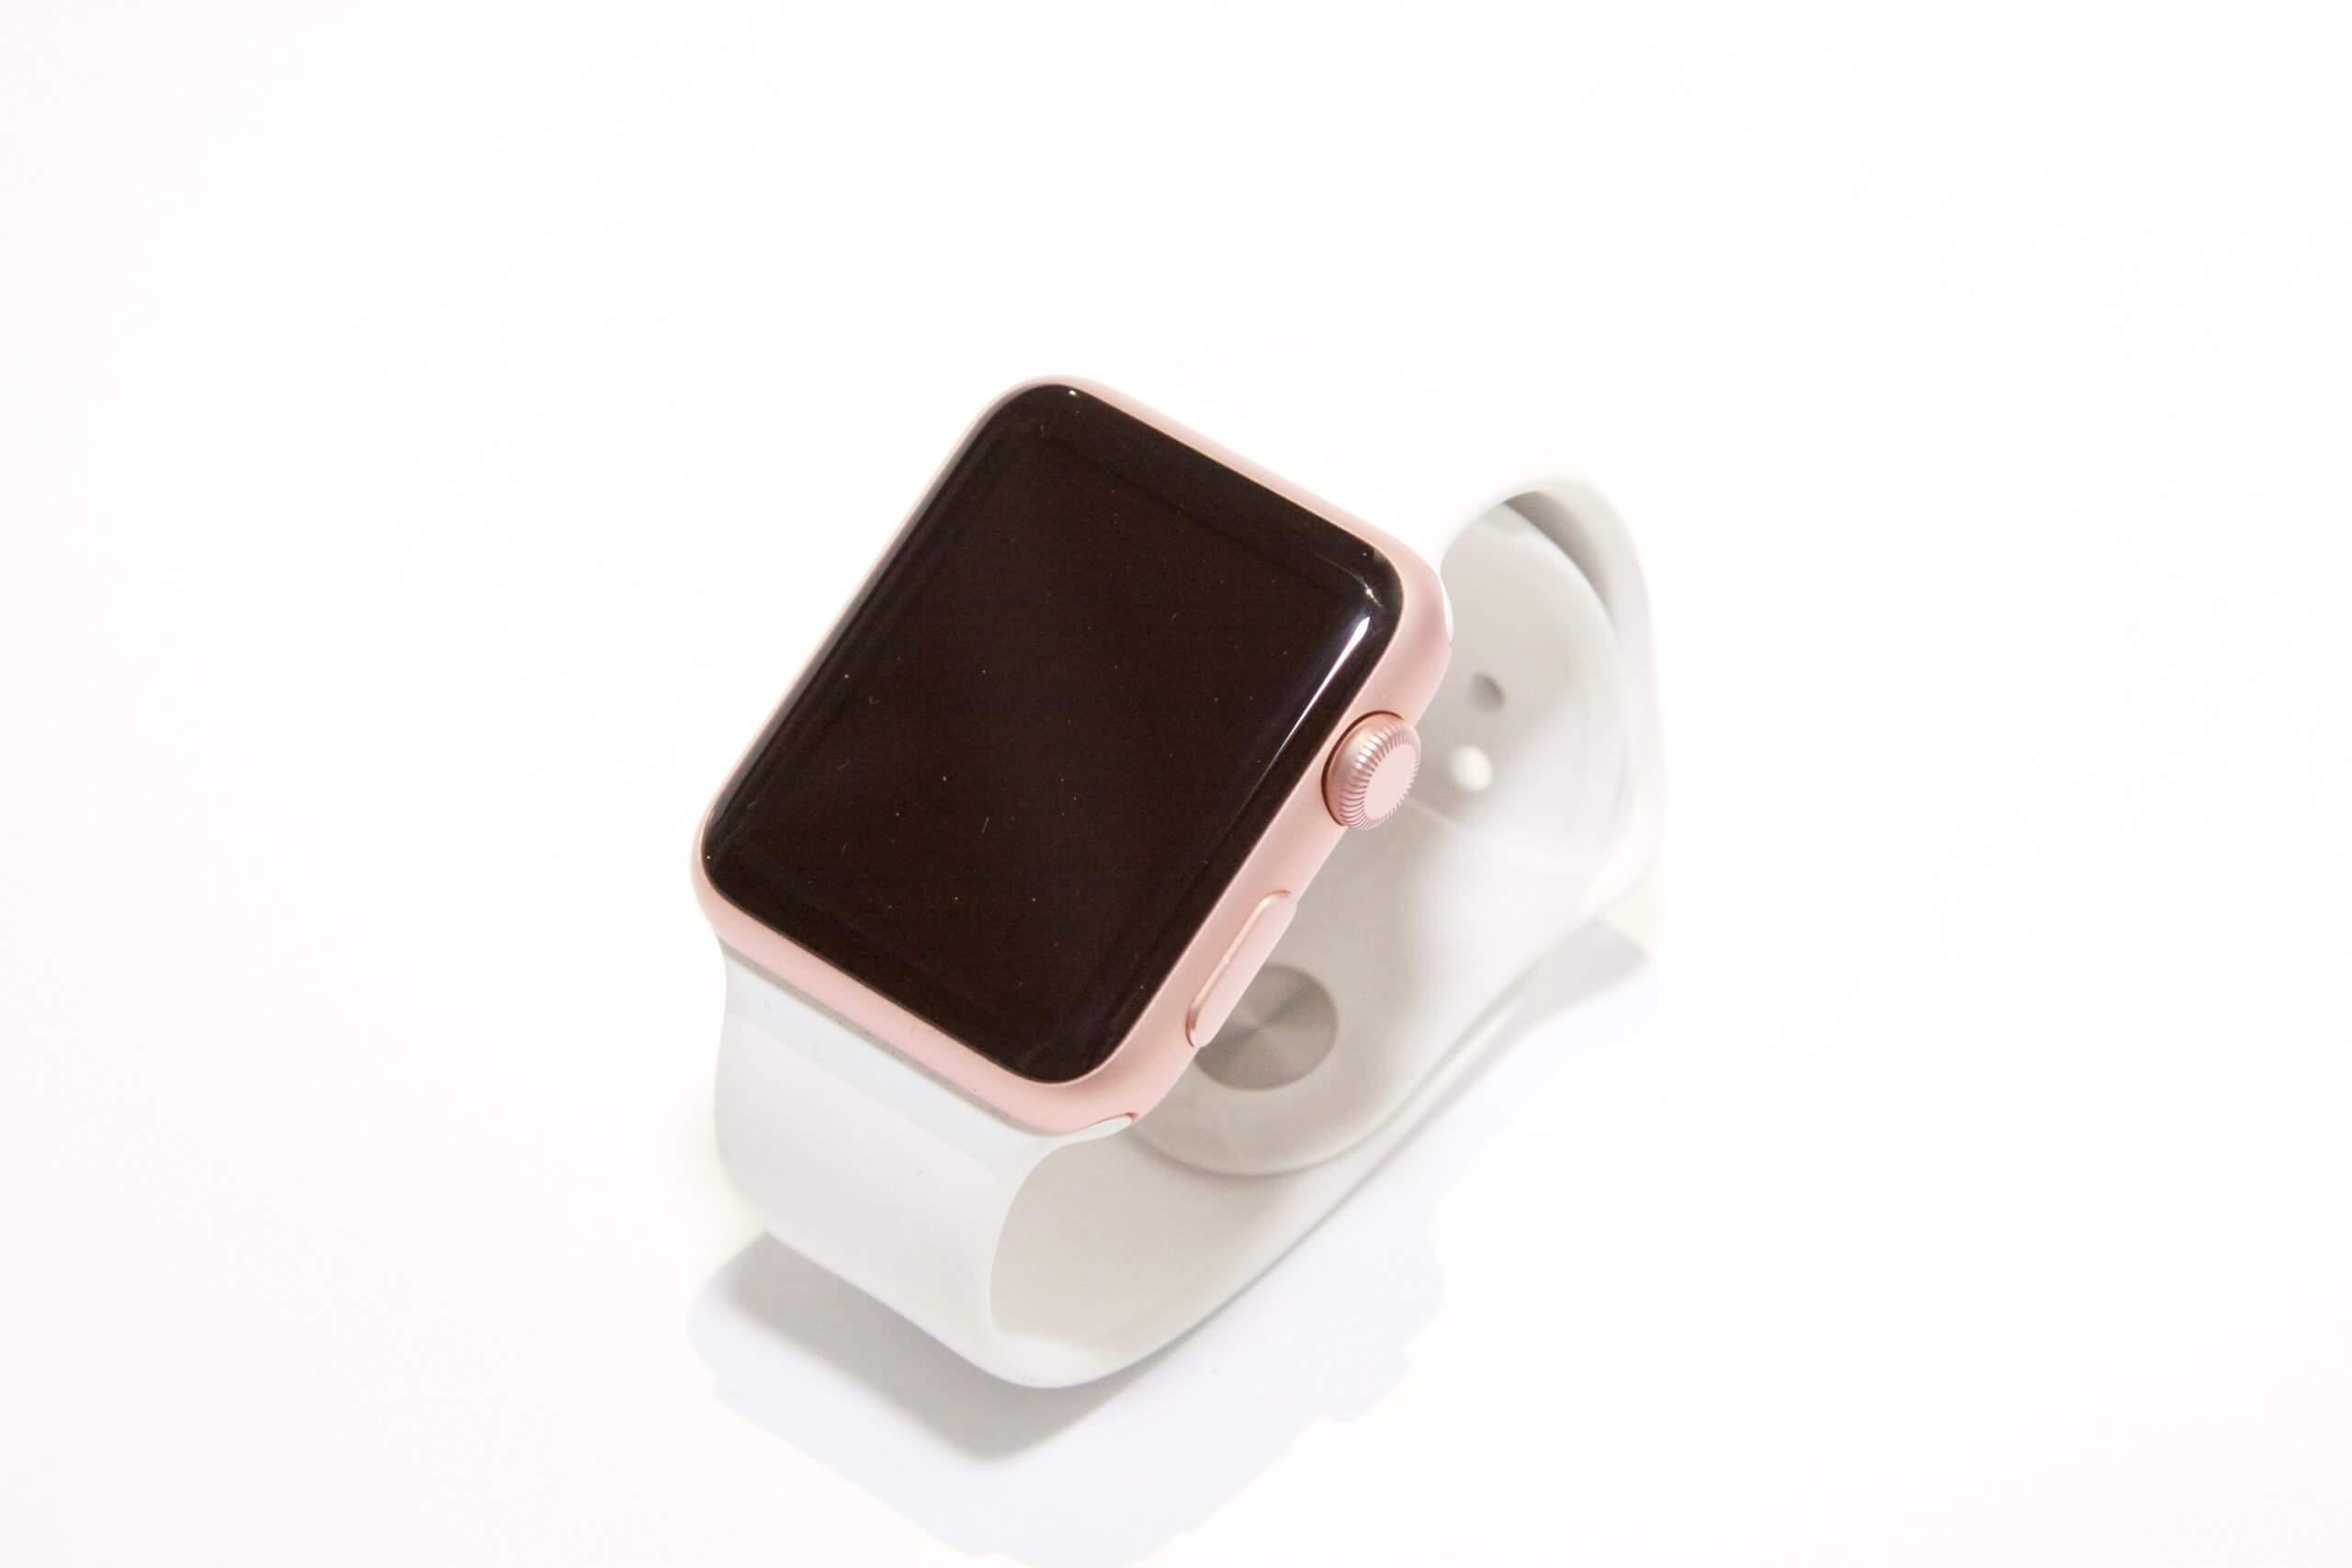 Apple Watch Reparatur Smartwatch-Repair